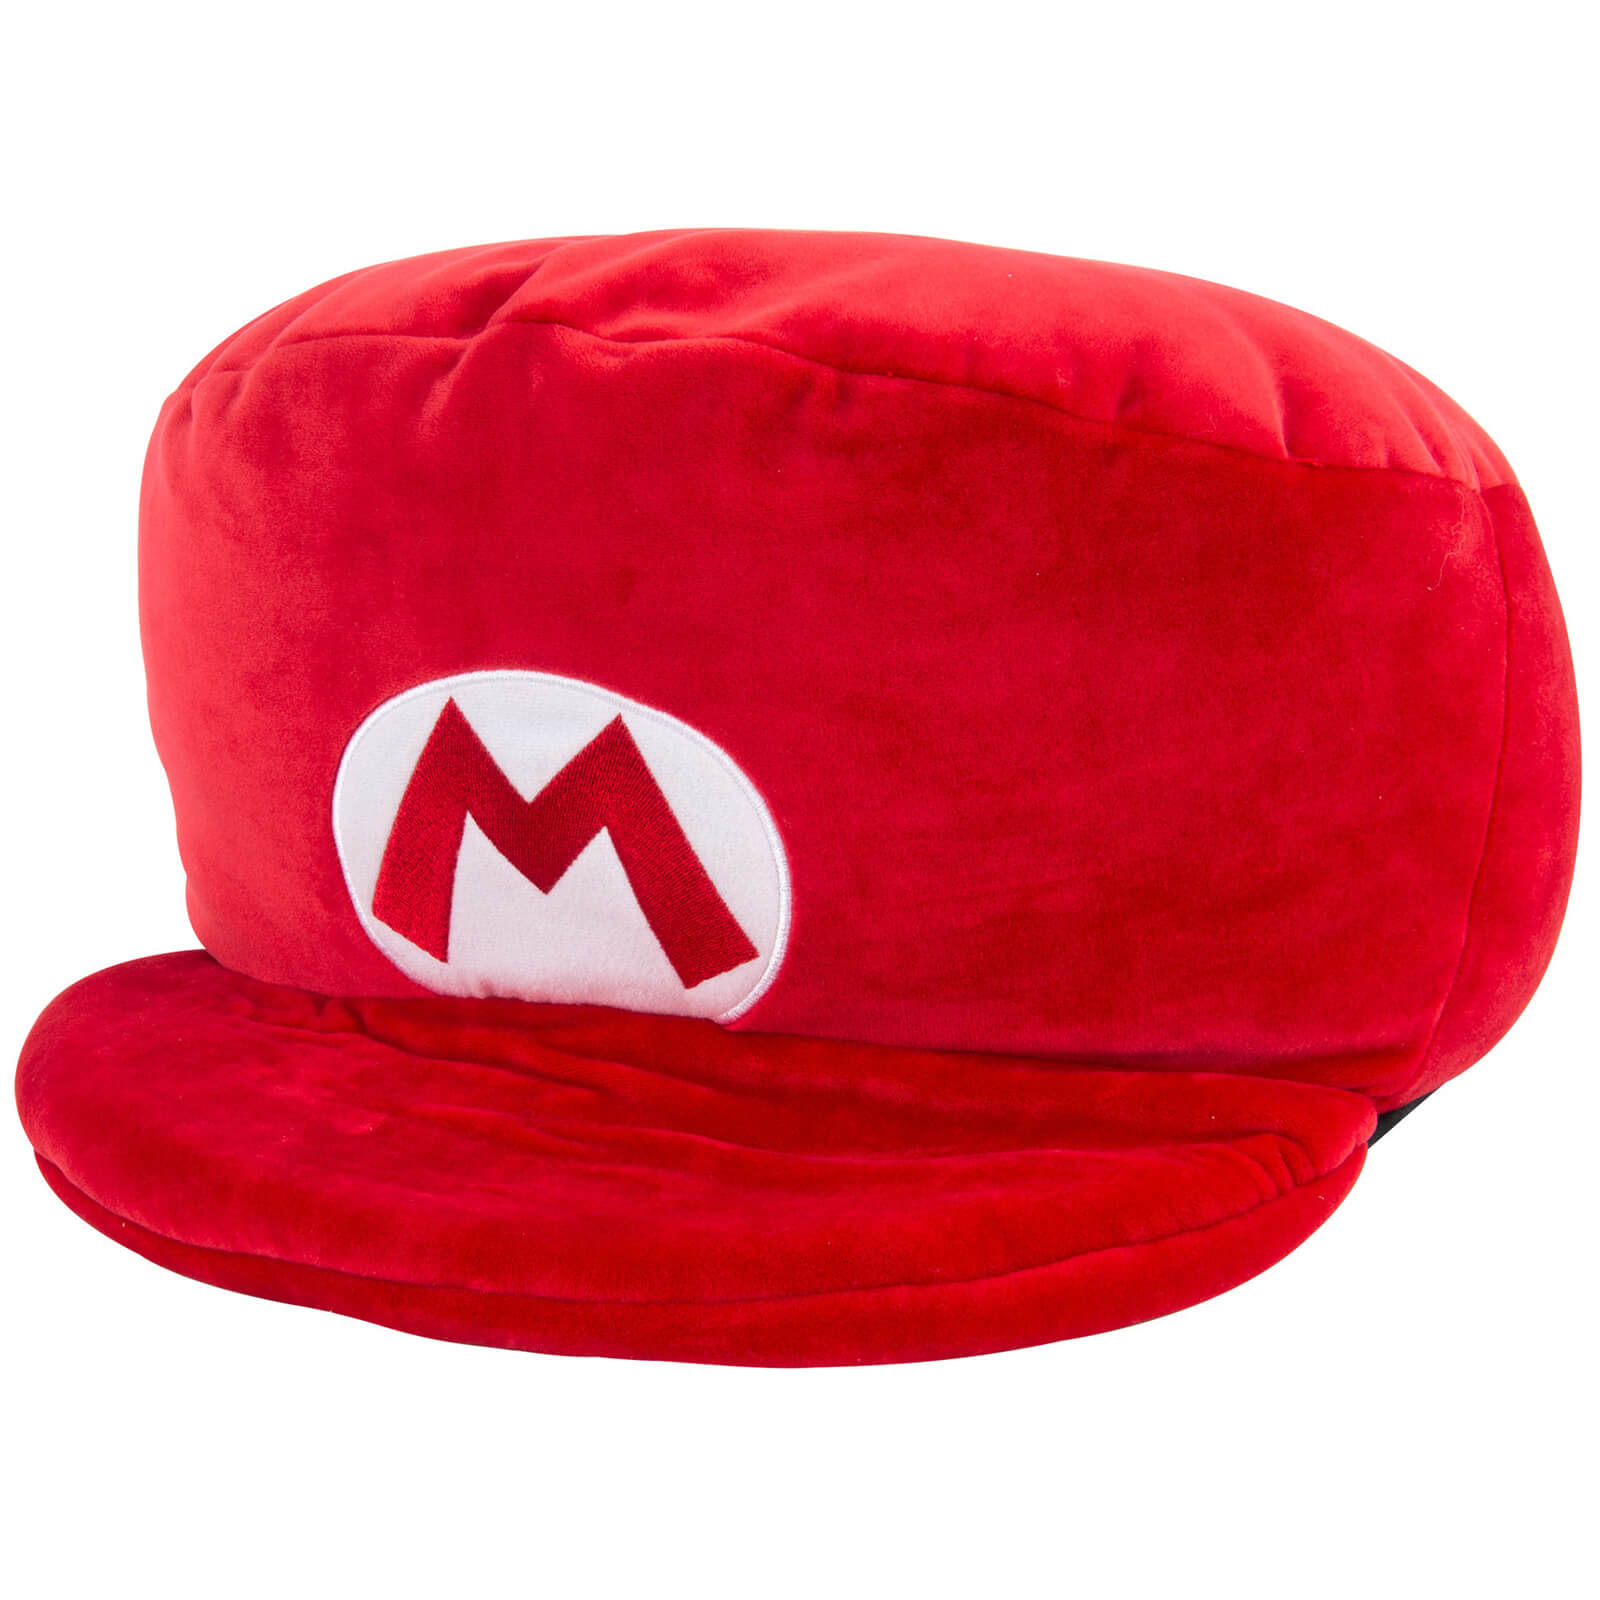 Image of Mario Kart Mega Mario Hat